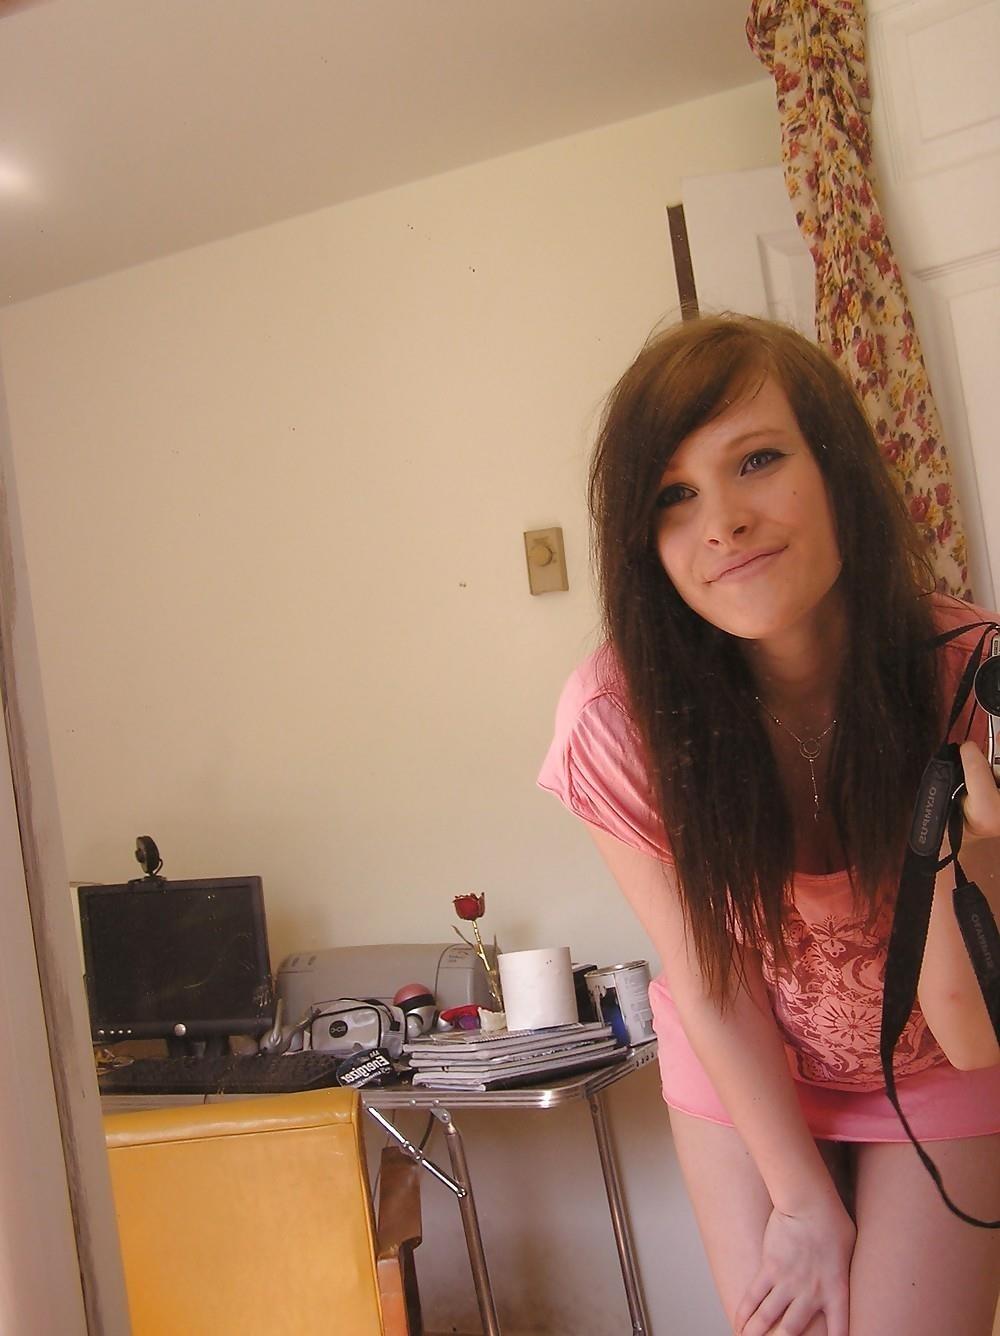 Hot teen self pics-4679